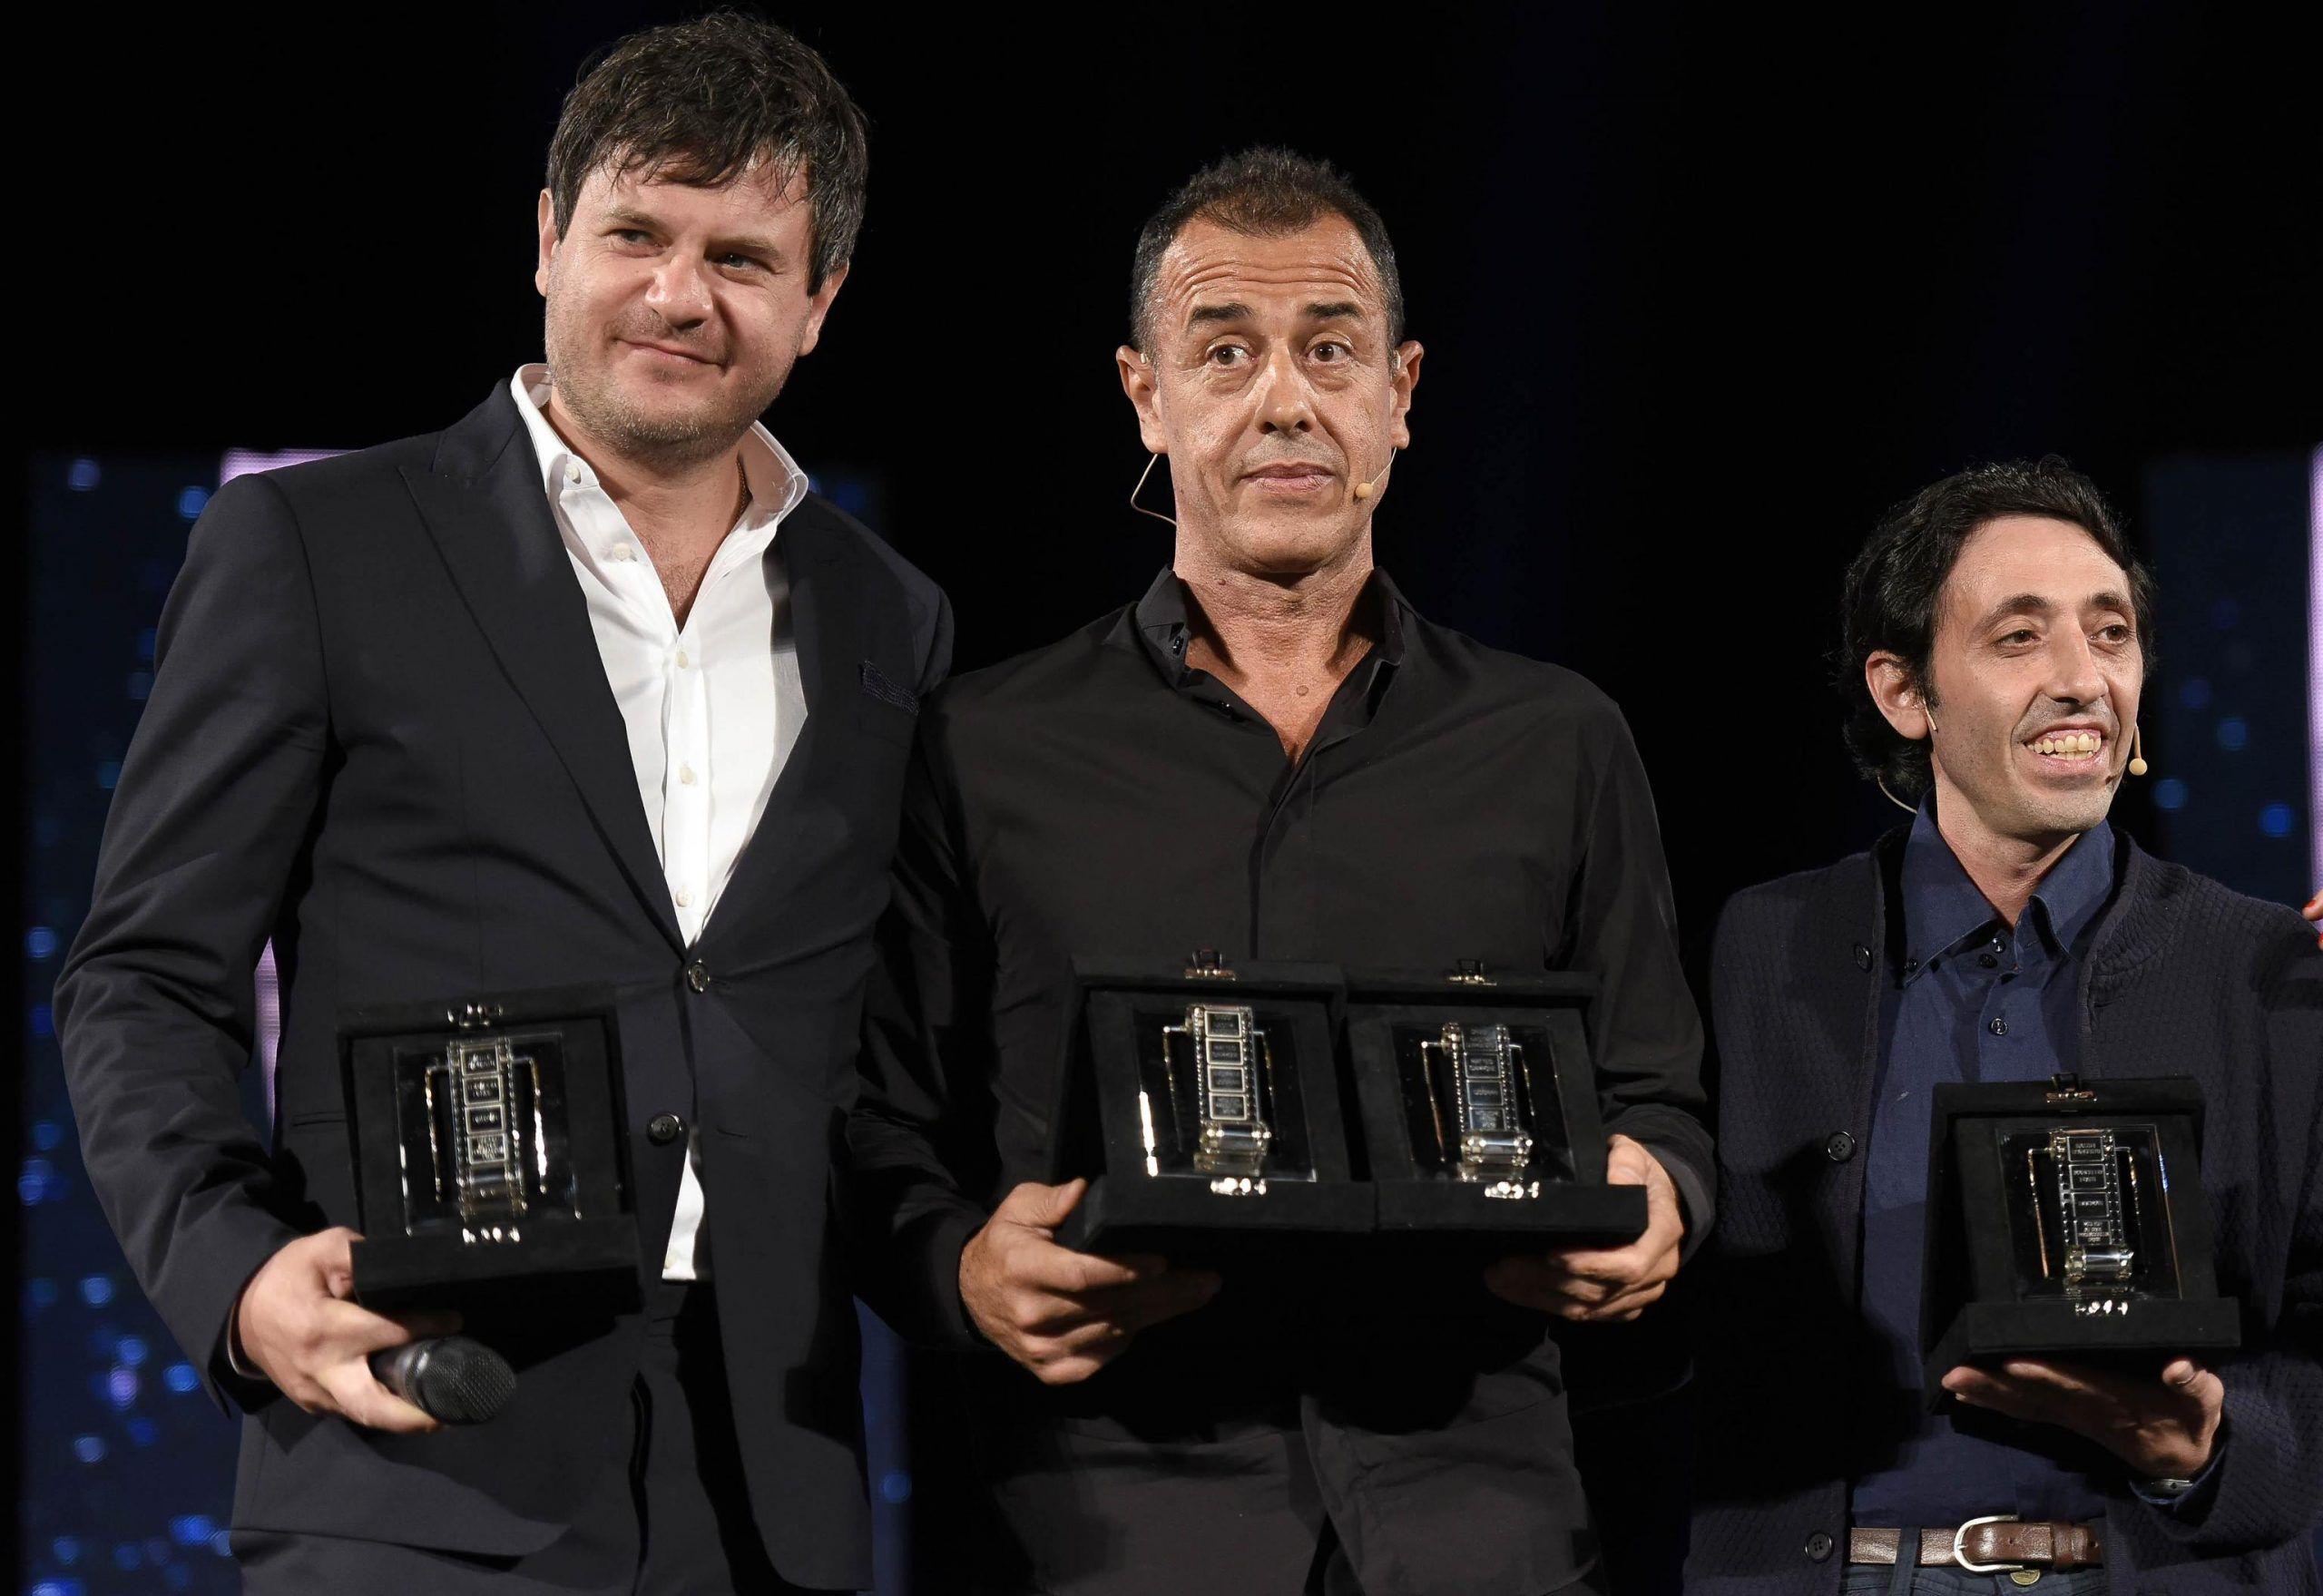 Oscar 2019, 'Dogman' di Matteo Garrone rappresenterà l'Italia